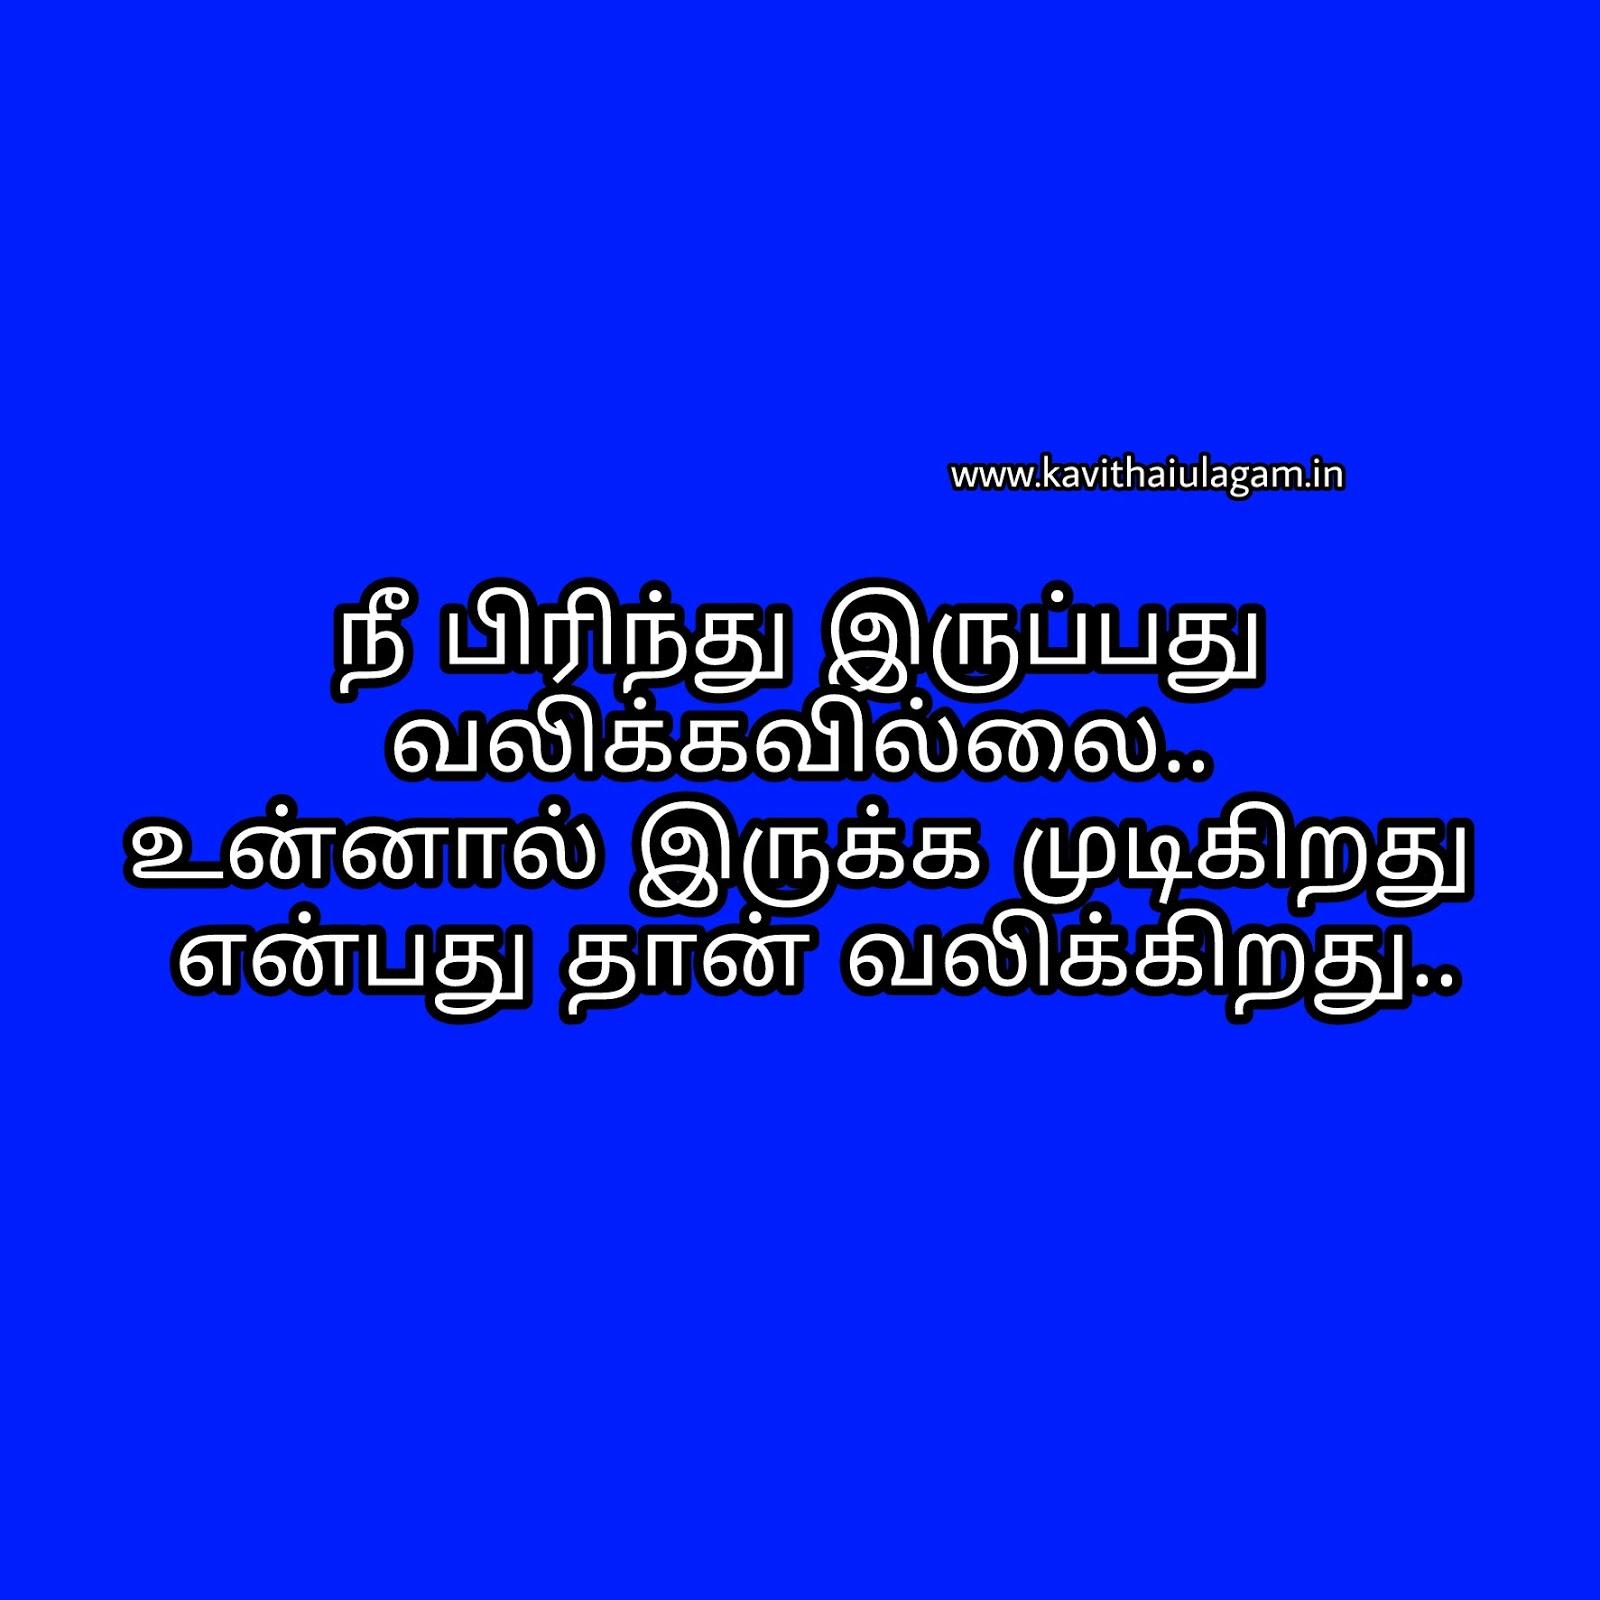 Sad love kavithai in tamil kadhal sogam kavithai images sad love pirivu kavithai kadhal vali kavithai tamil kavithai love images hd thecheapjerseys Image collections